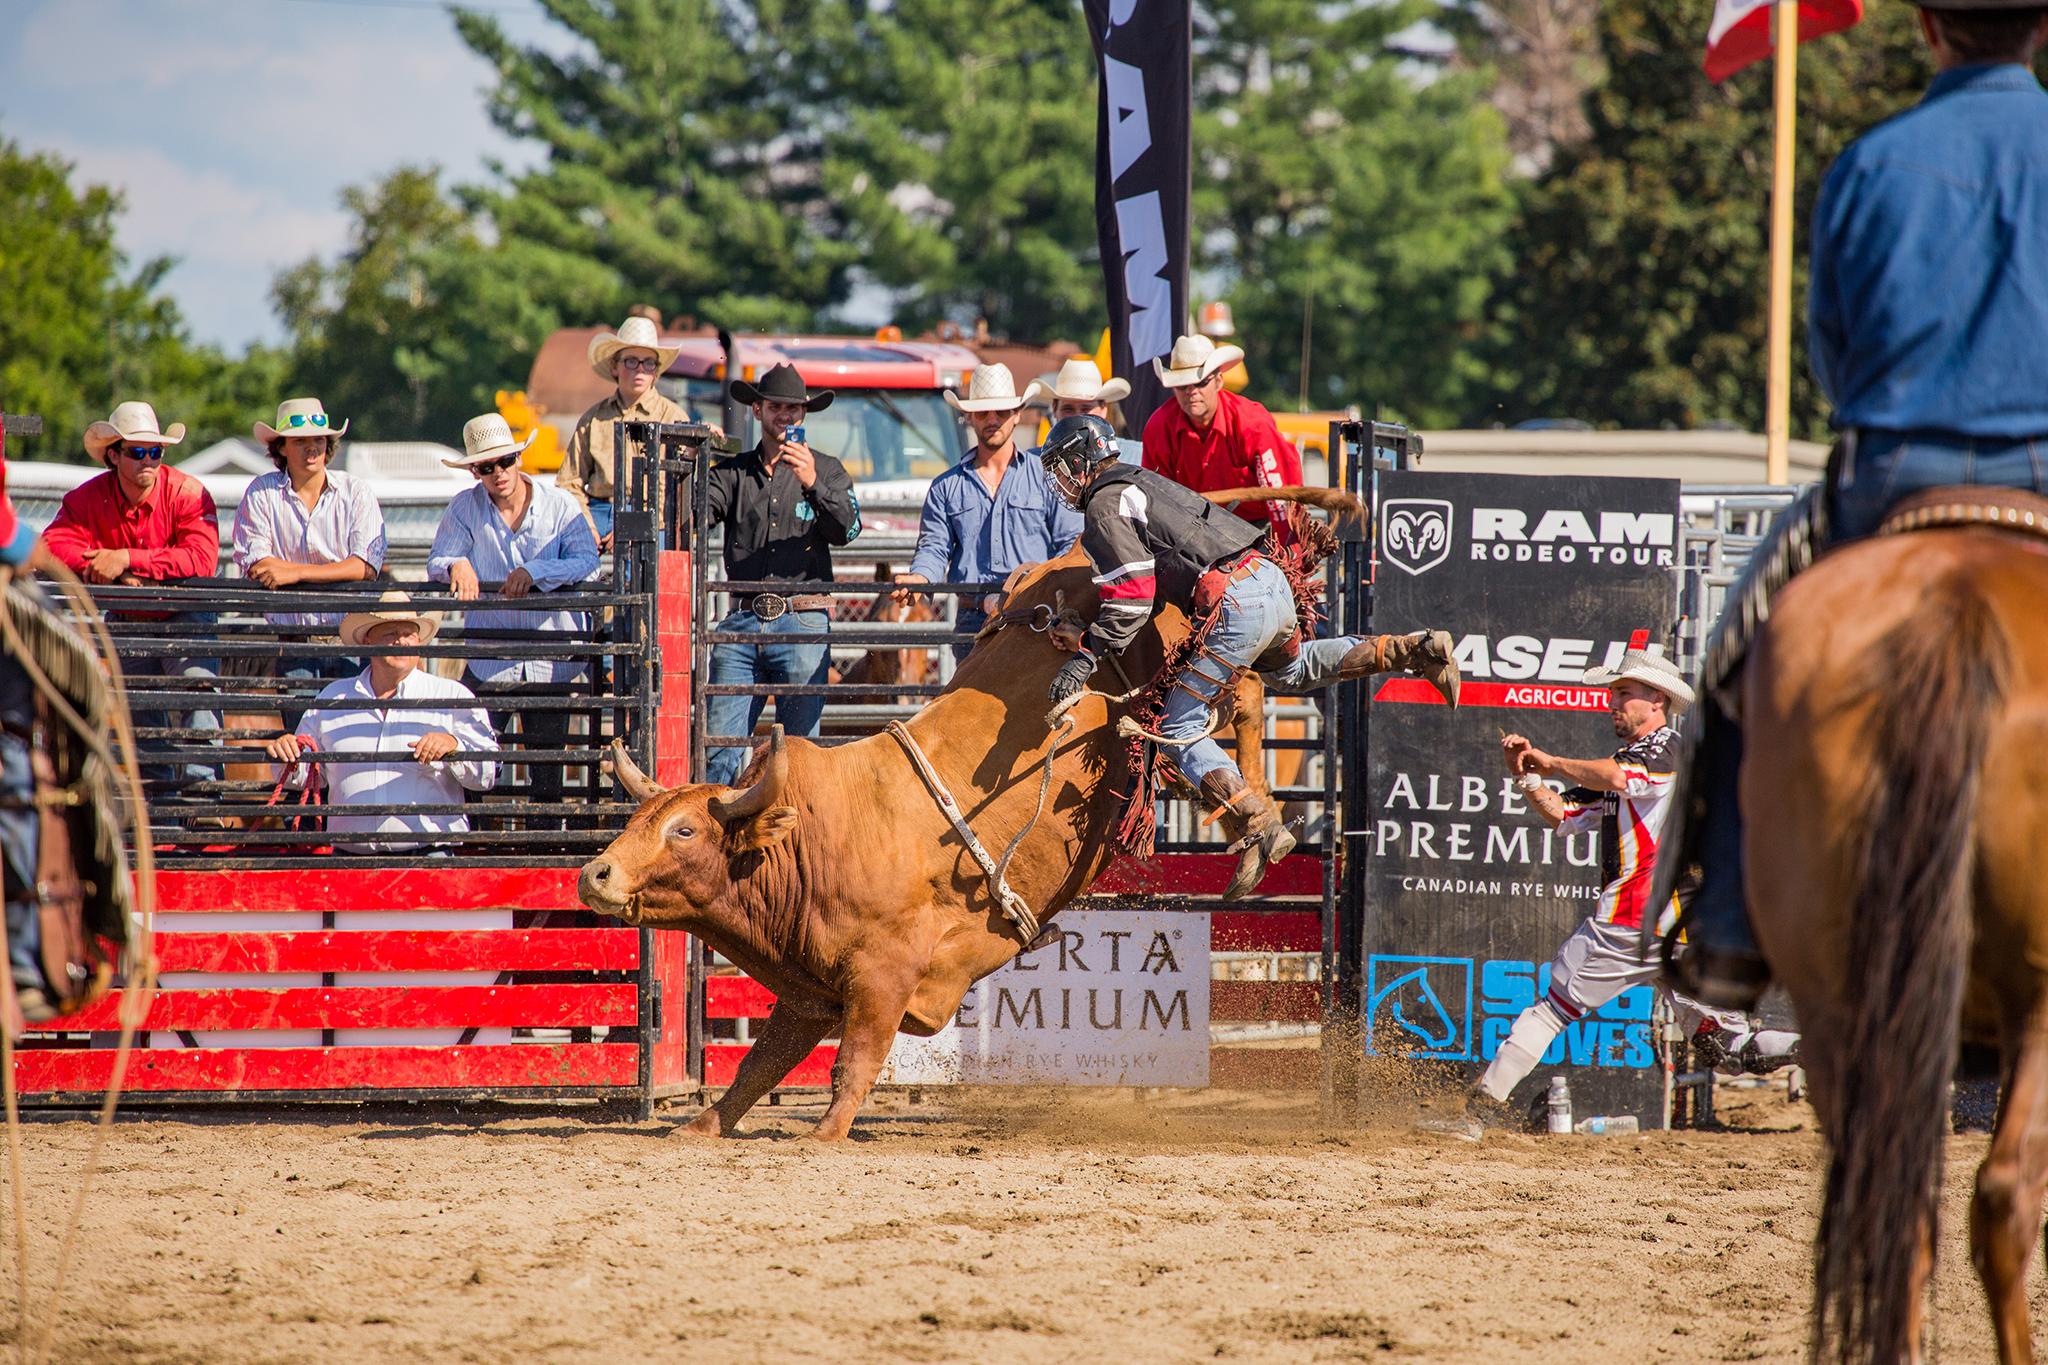 Ram Rodeo Tour - Beachburg - 23 July 2016 - 092 (2048).jpg